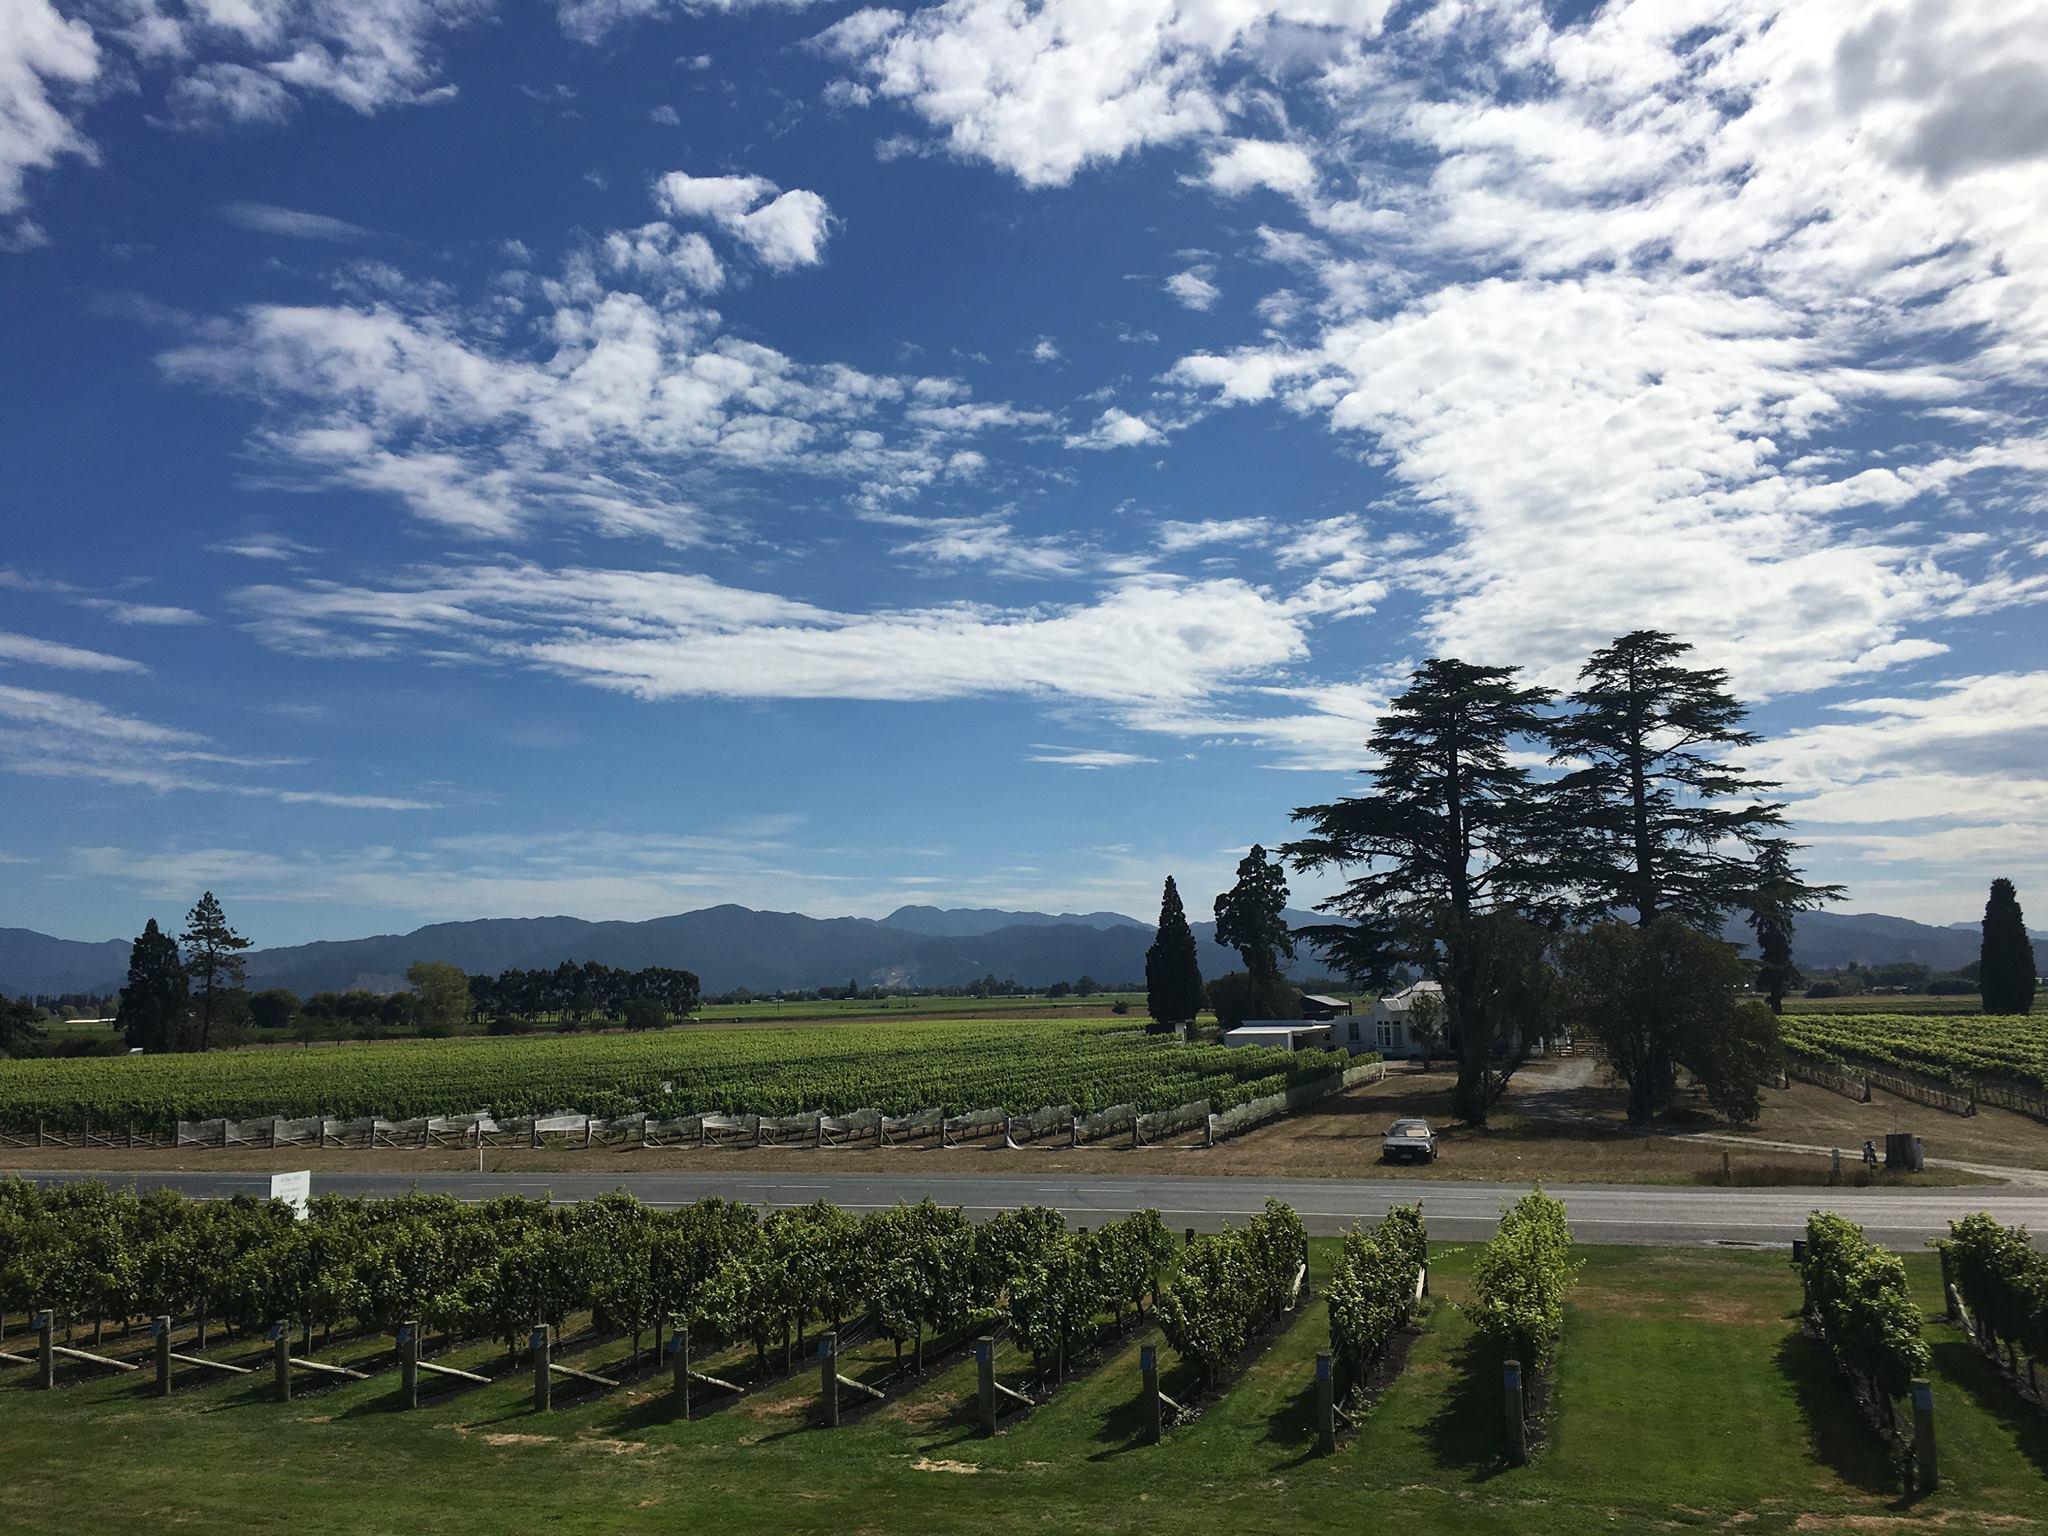 nz-southisland-blenheim-vineyard-meredith